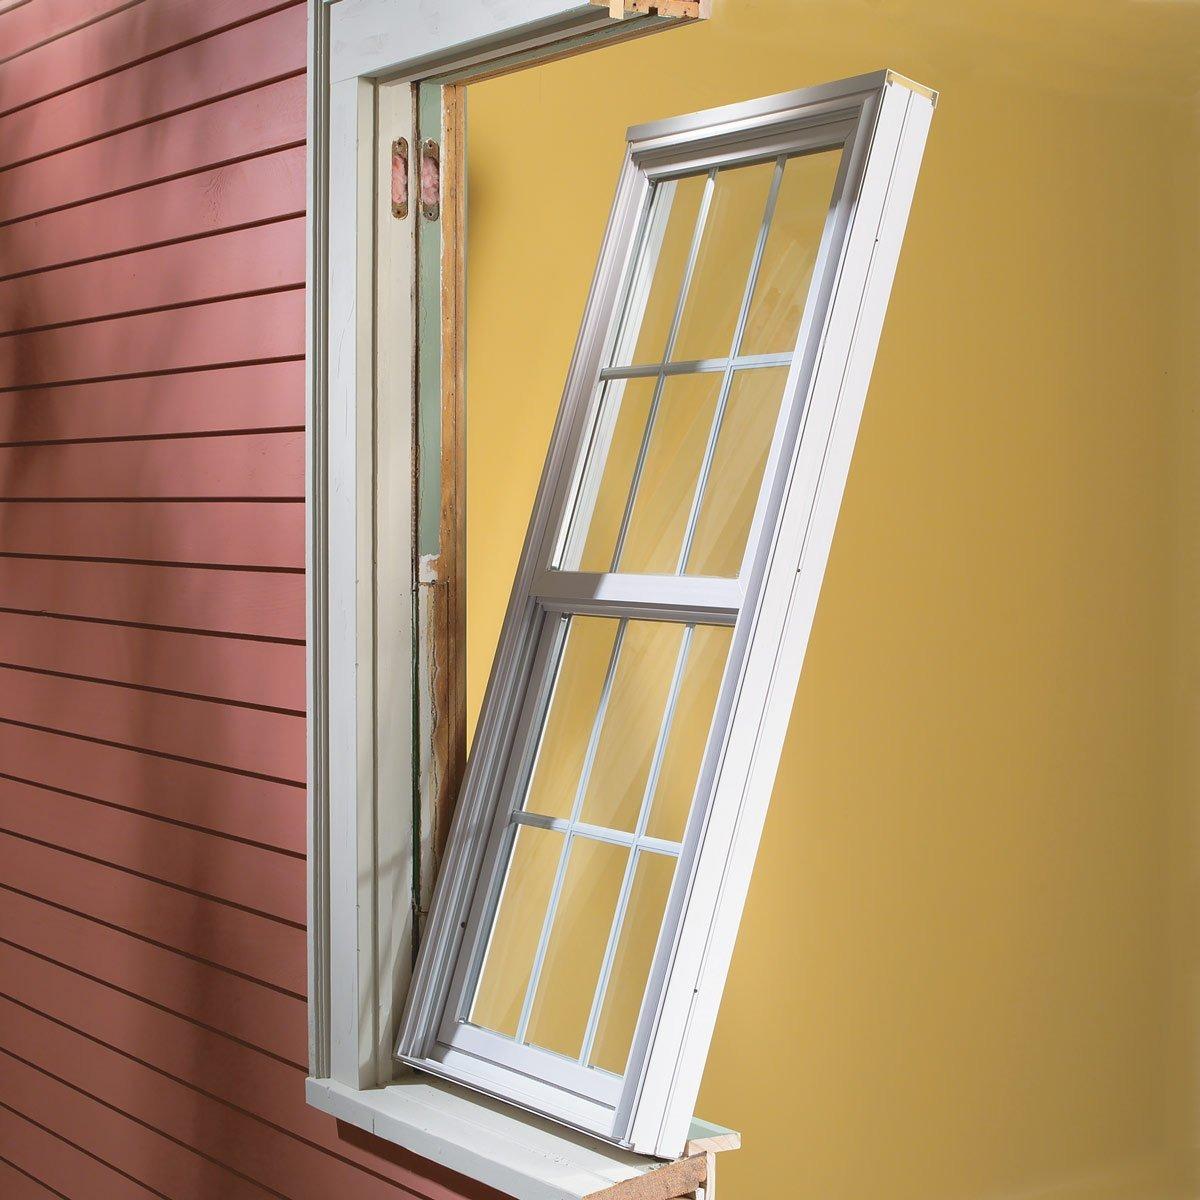 The Window N Door Company - Mableton, GA 30126 - (404)946-3697 | ShowMeLocal.com